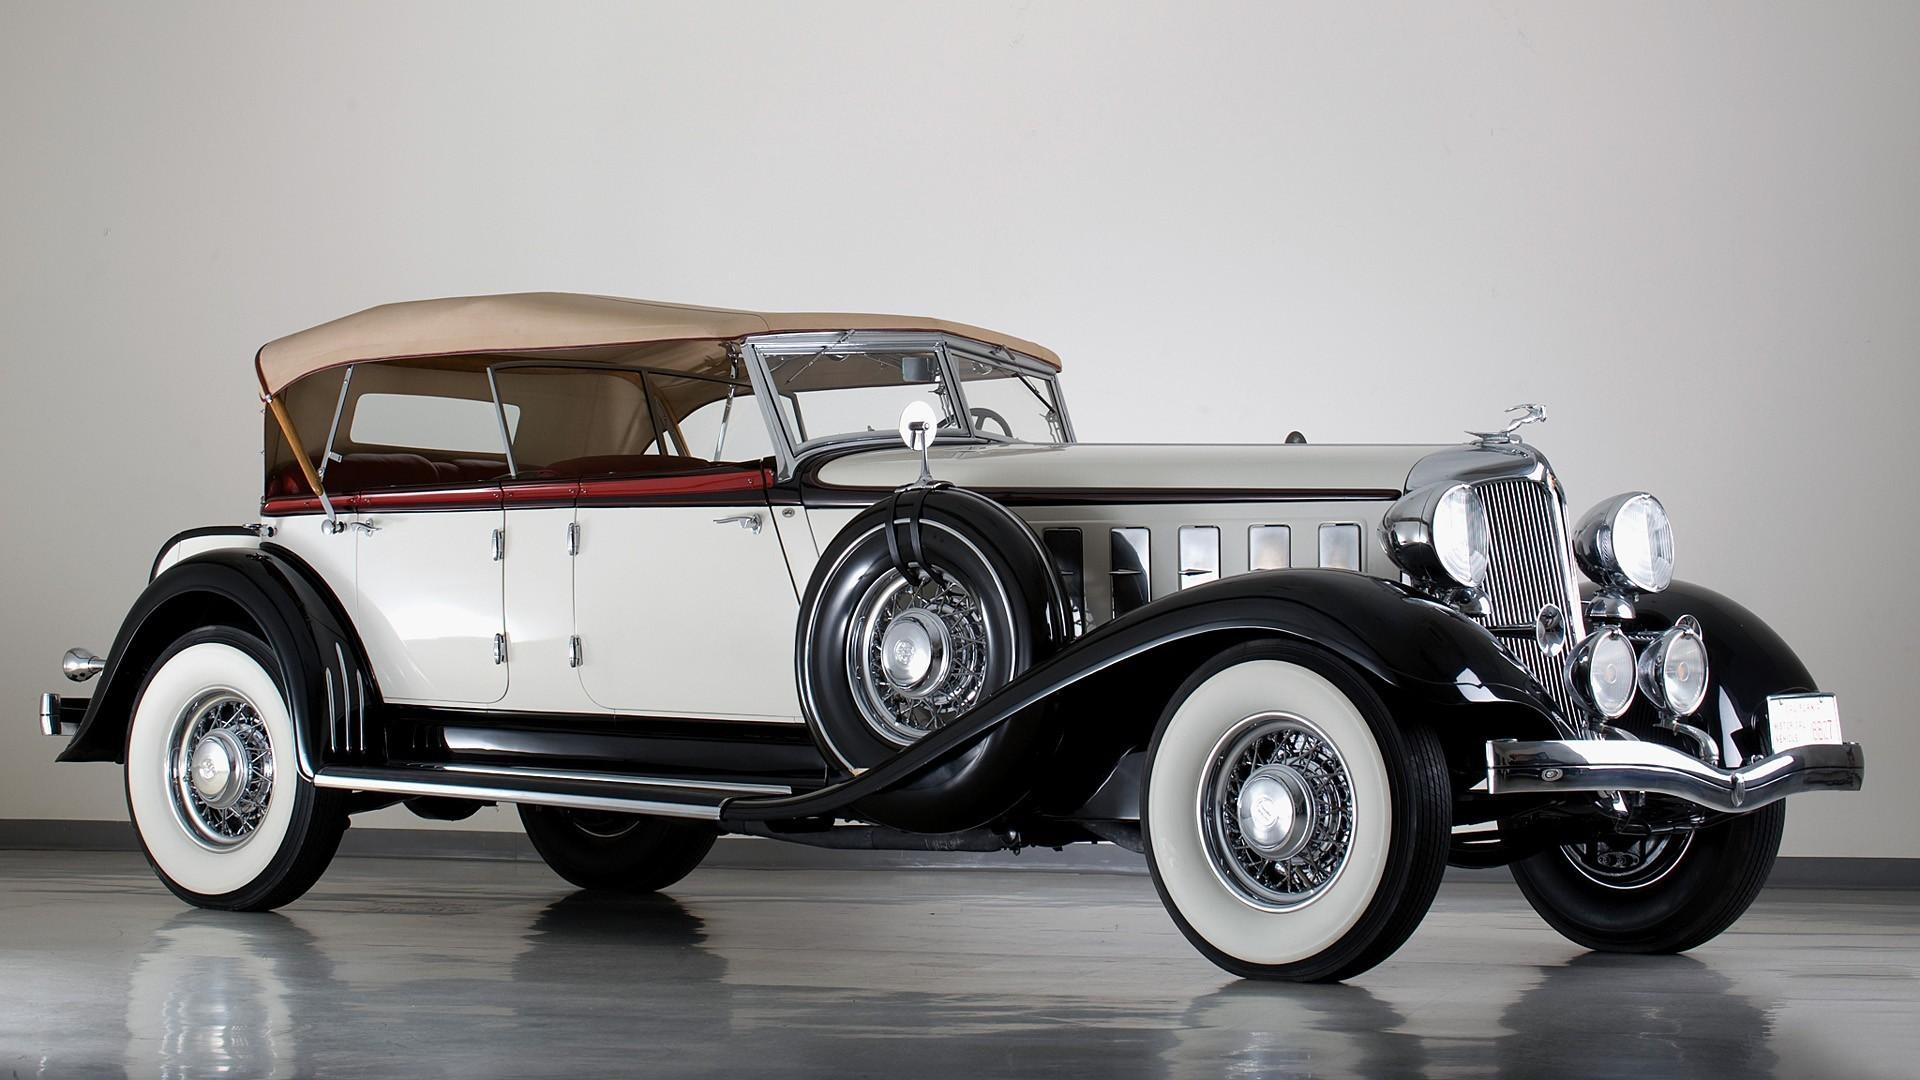 Cars Classic Wallpaper Cars, Classic, Cars